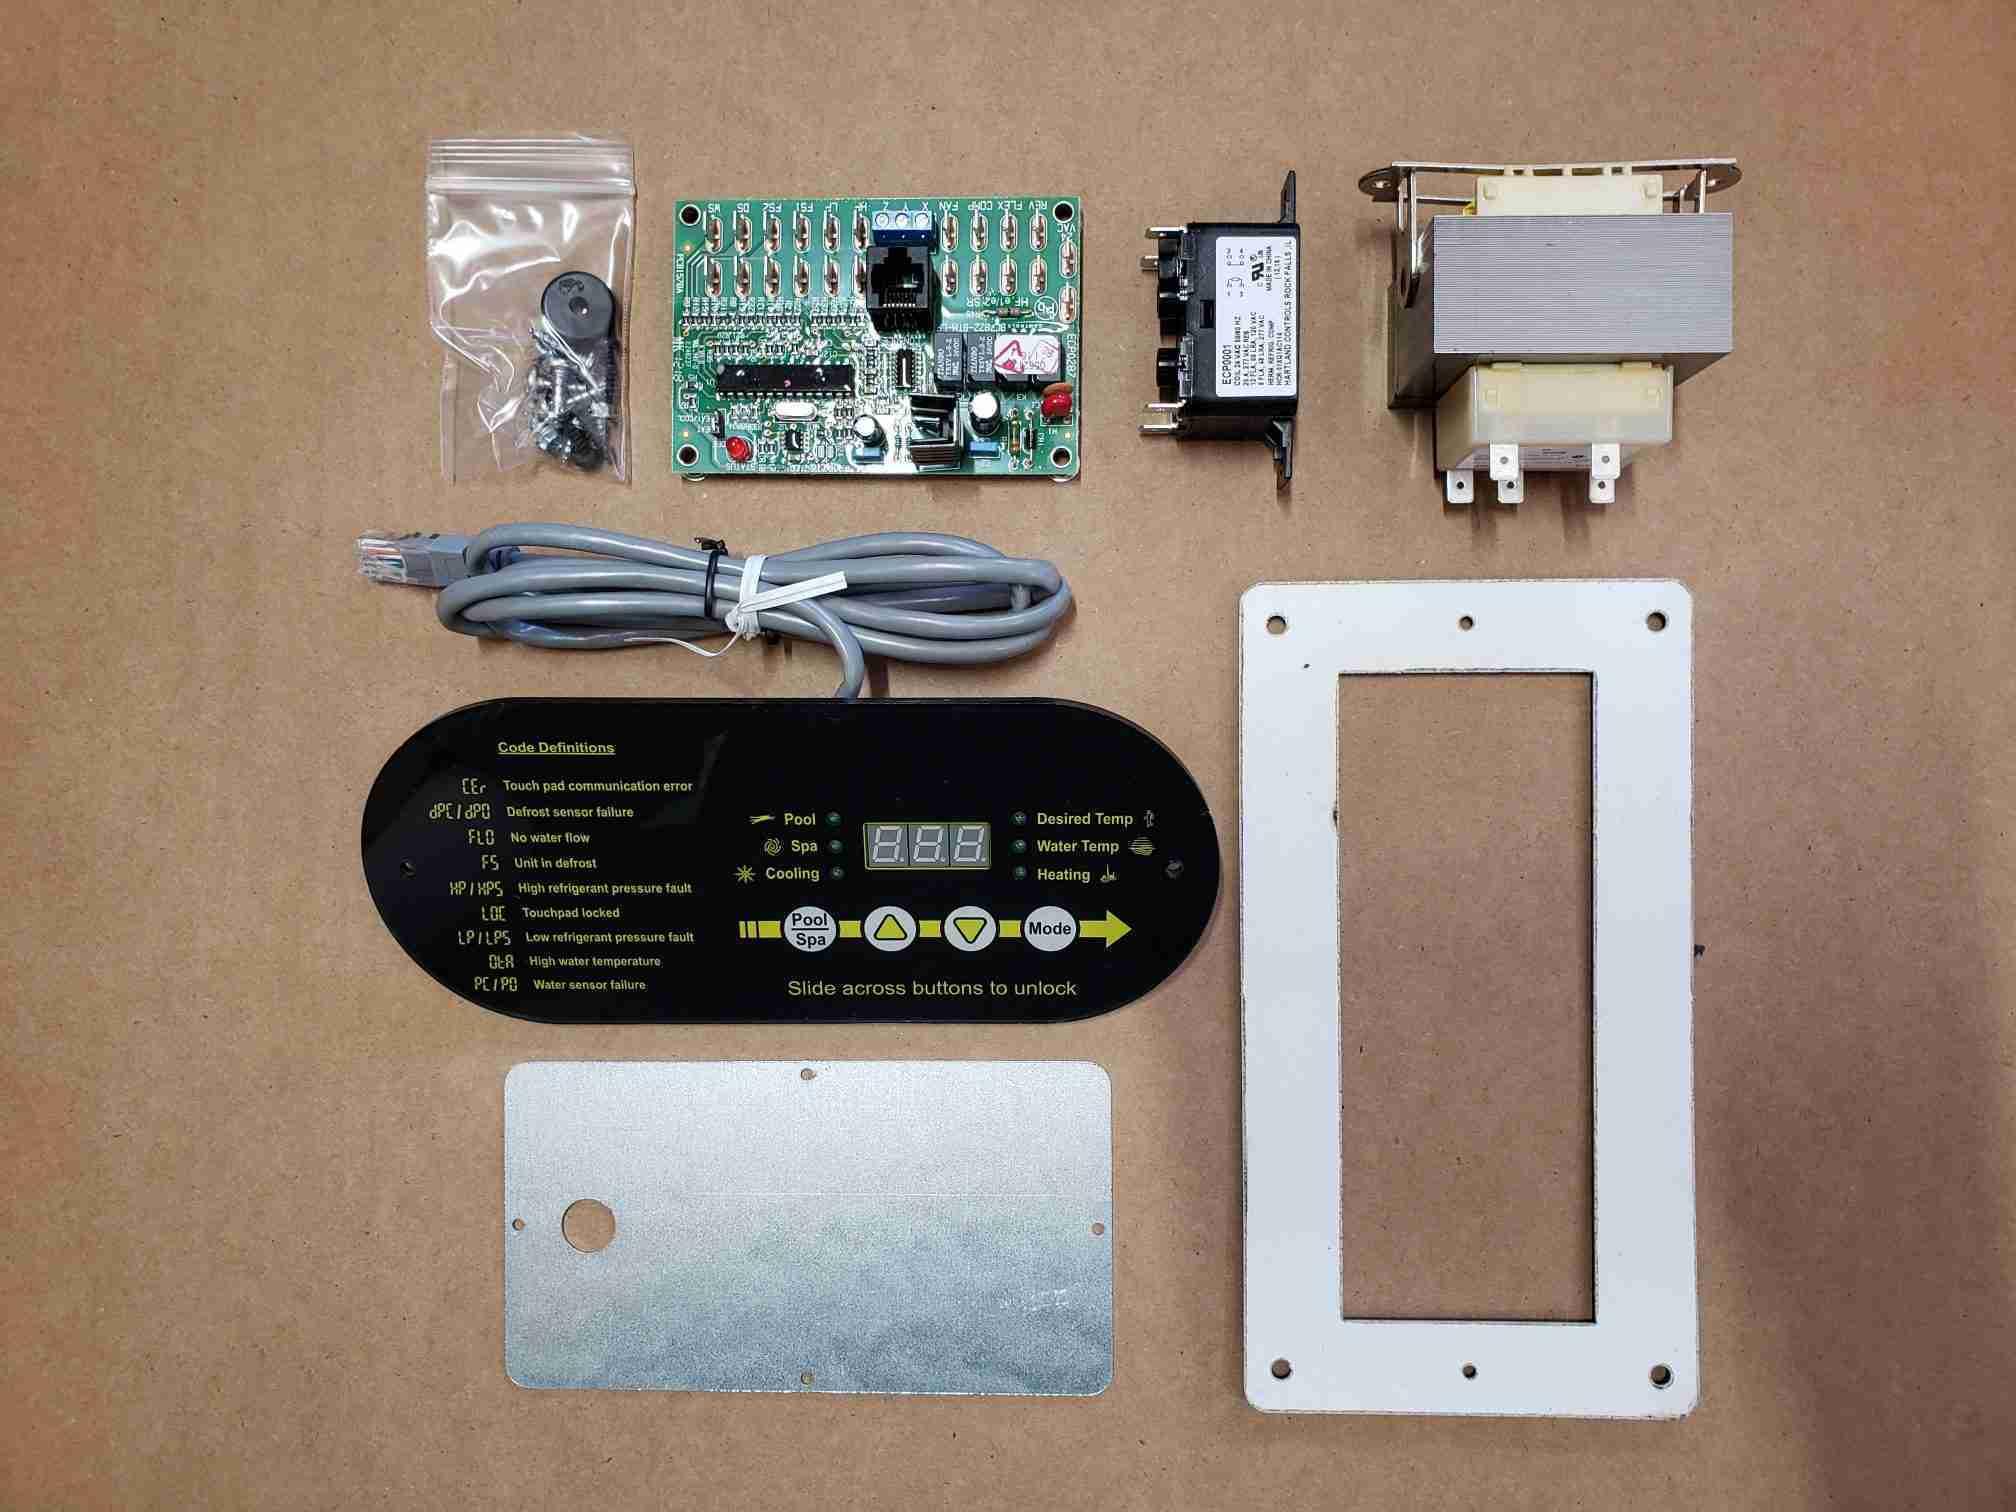 Overview of Heat Pump Display Retrofit Kit